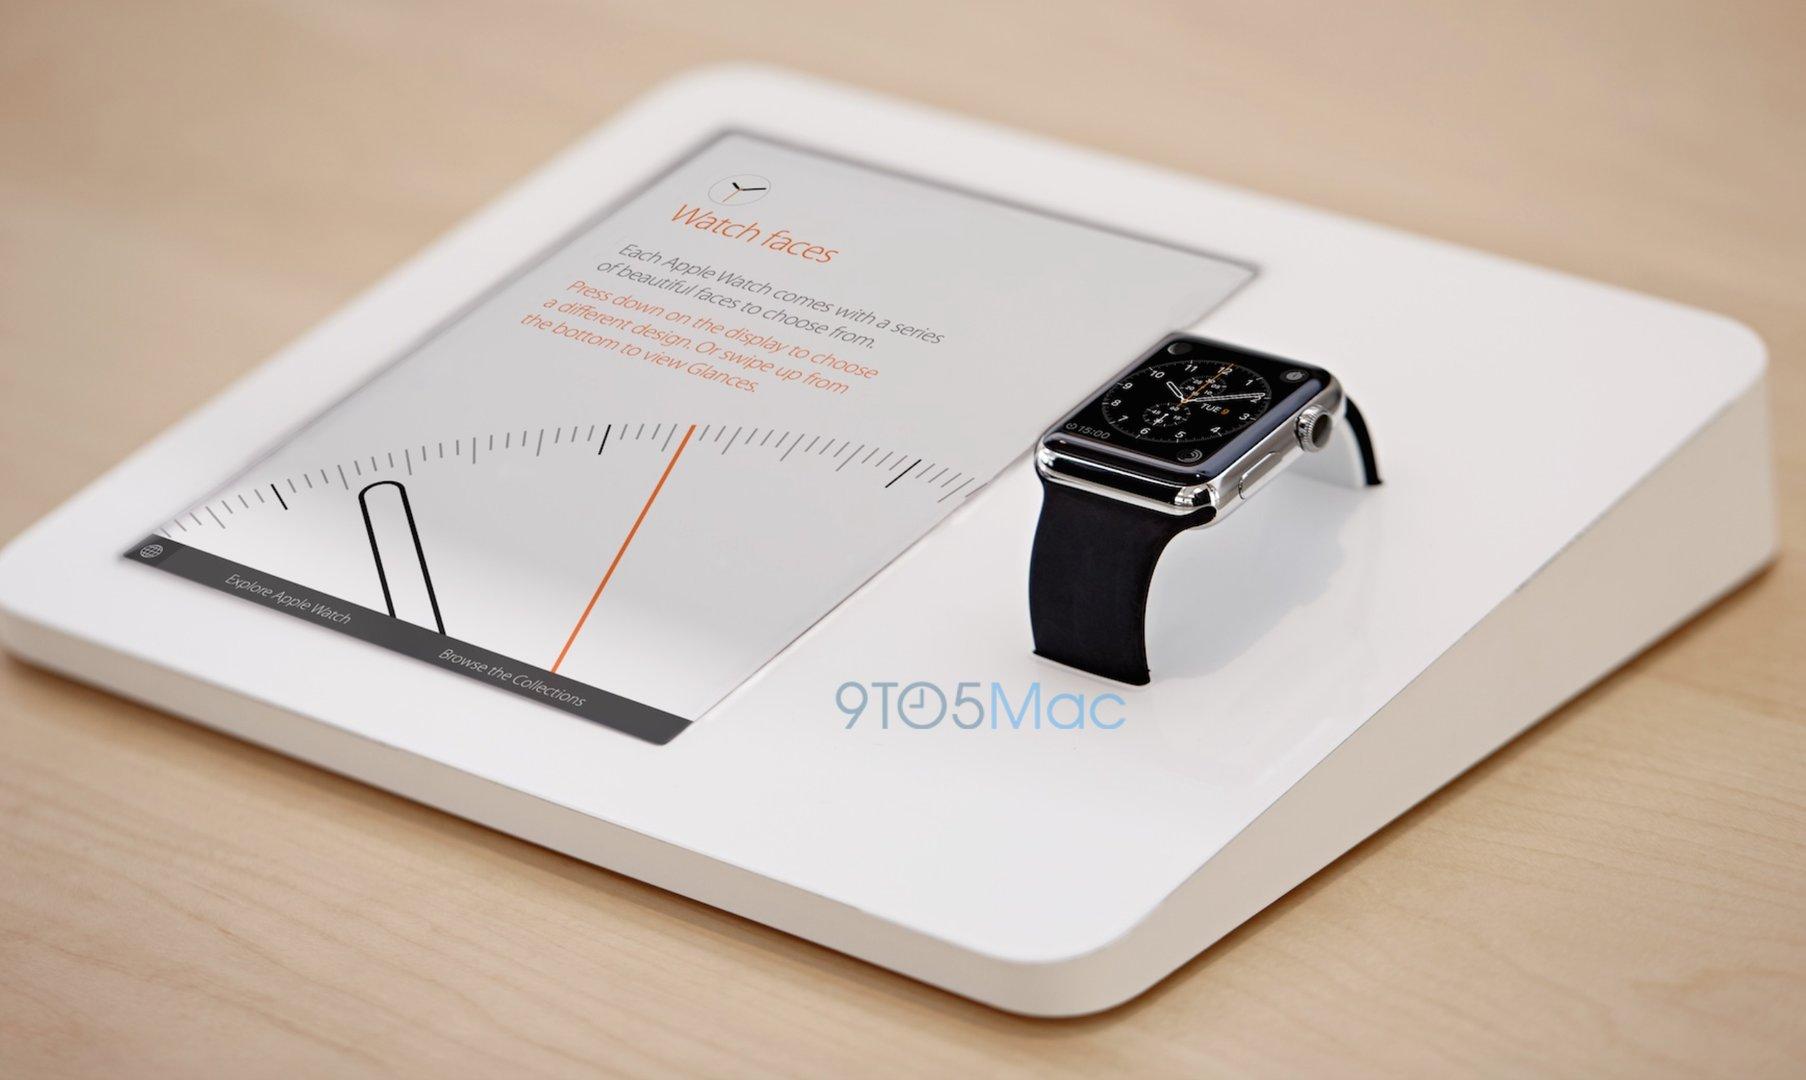 Demo-Einheit mit iPad mini